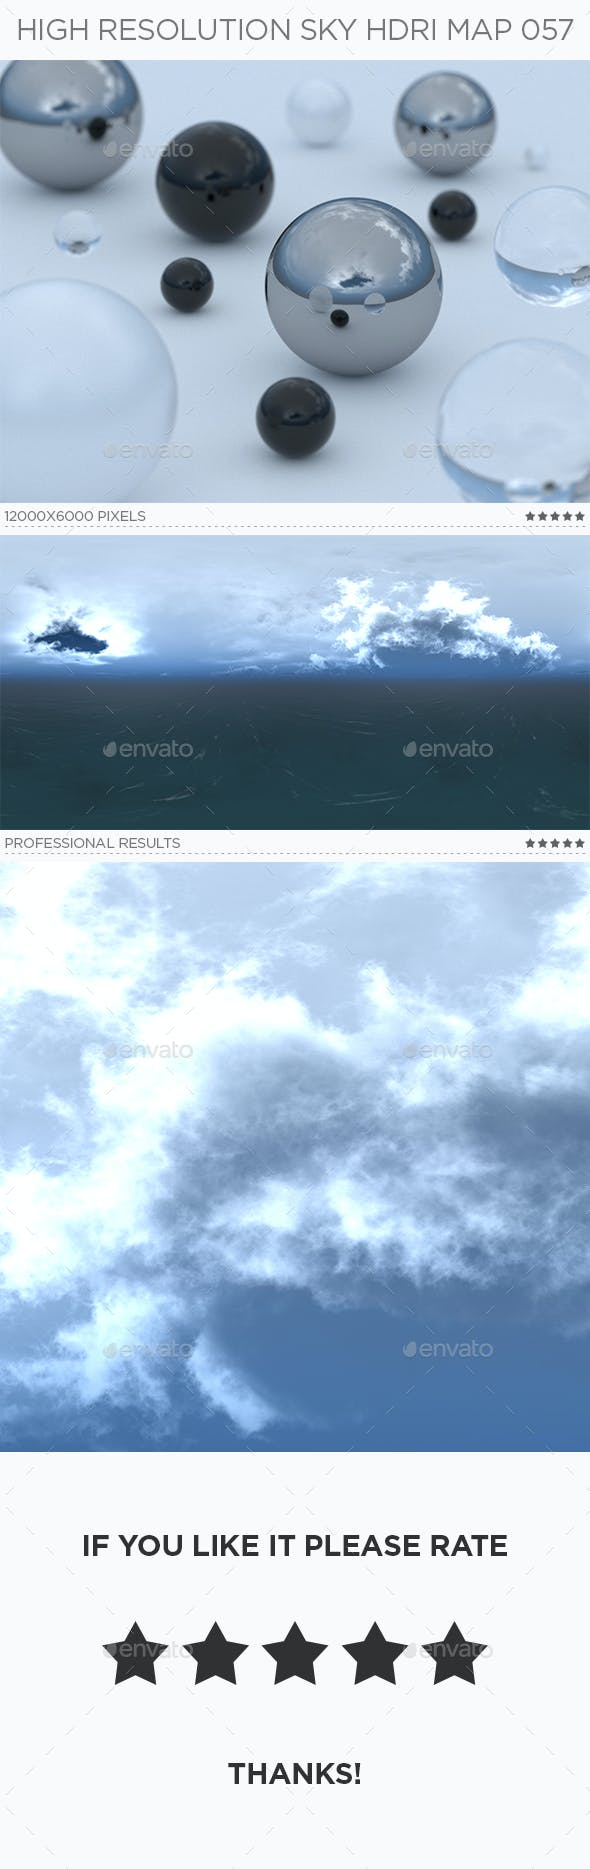 High Resolution Sky HDRi Map 057 - 3DOcean Item for Sale